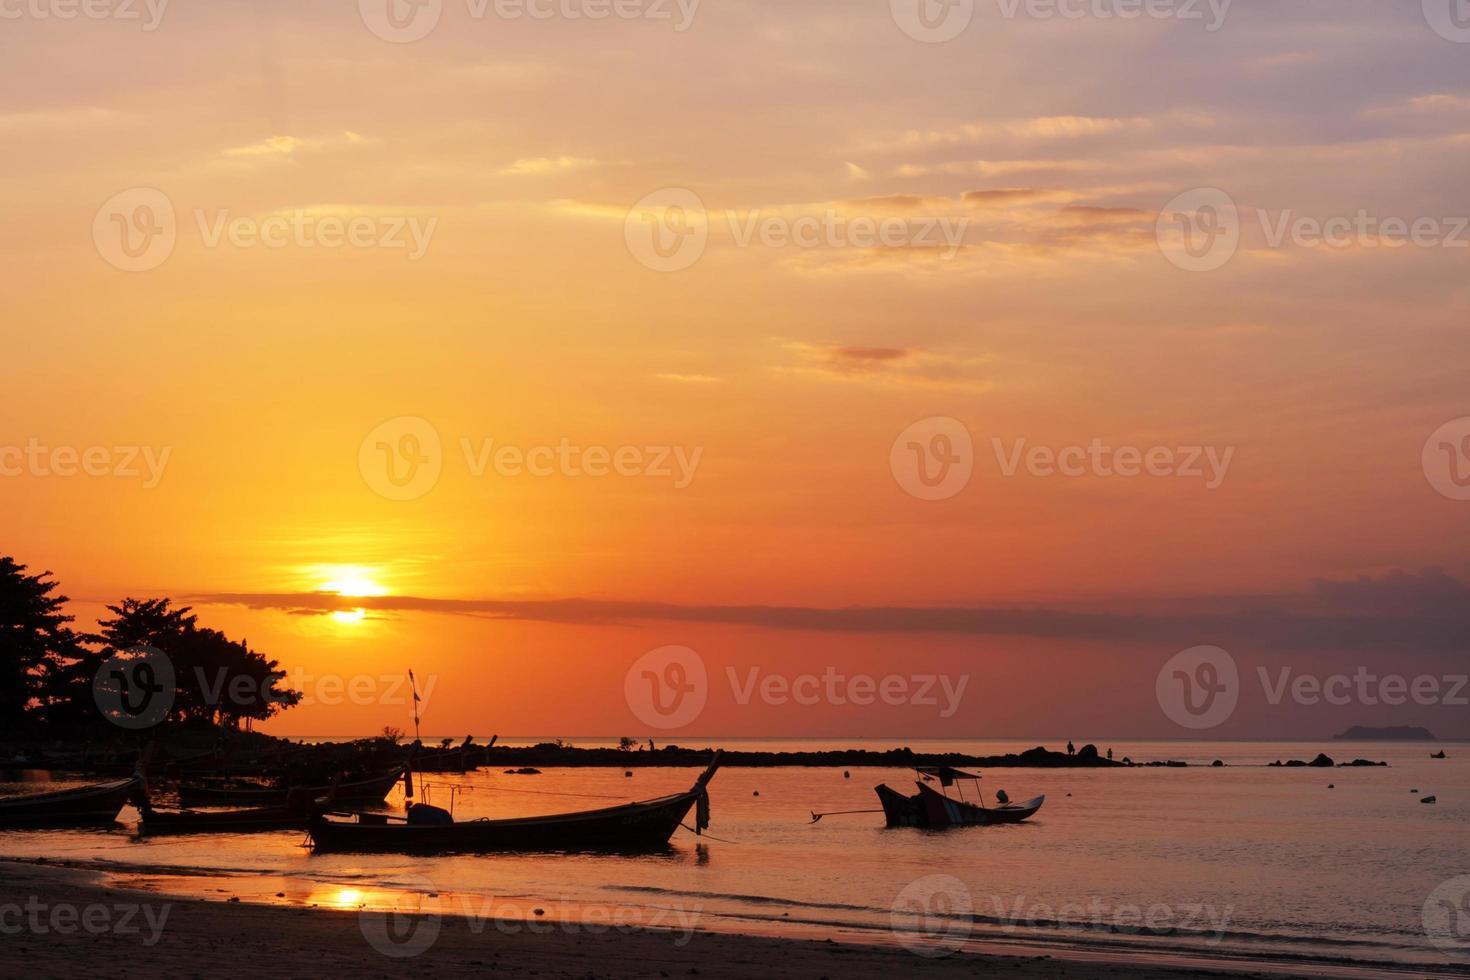 vissersboot en zonsondergang foto